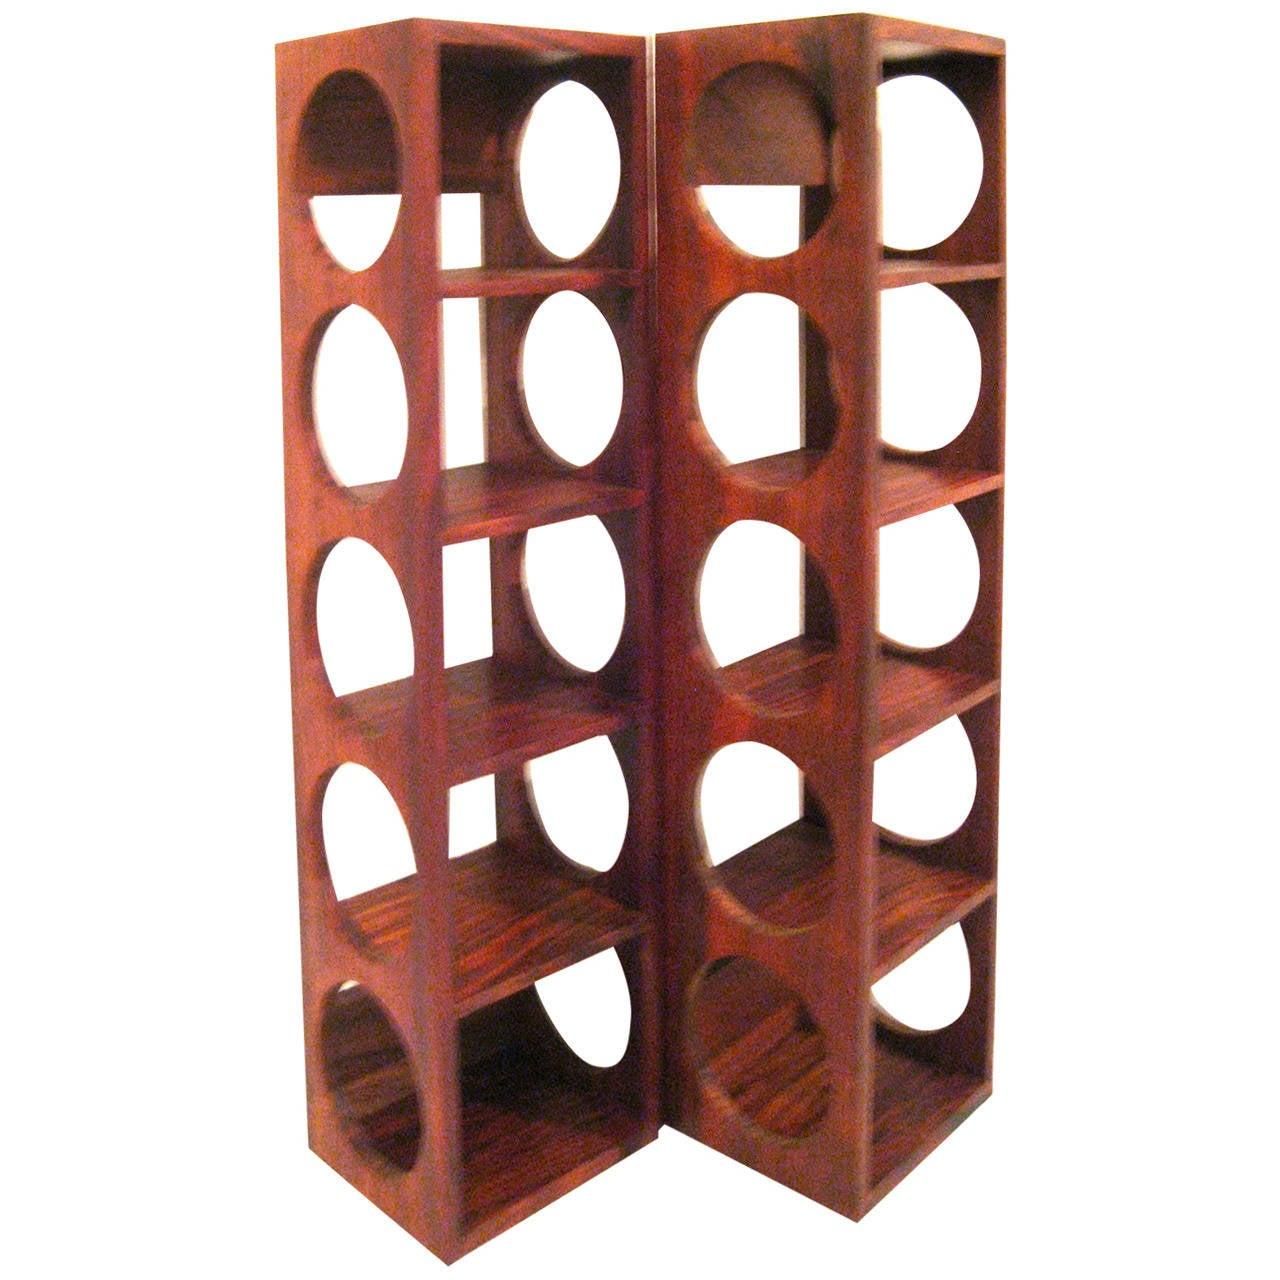 danish modern rosewood set of wallmounted wine racks at stdibs - danish modern rosewood set of wallmounted wine racks